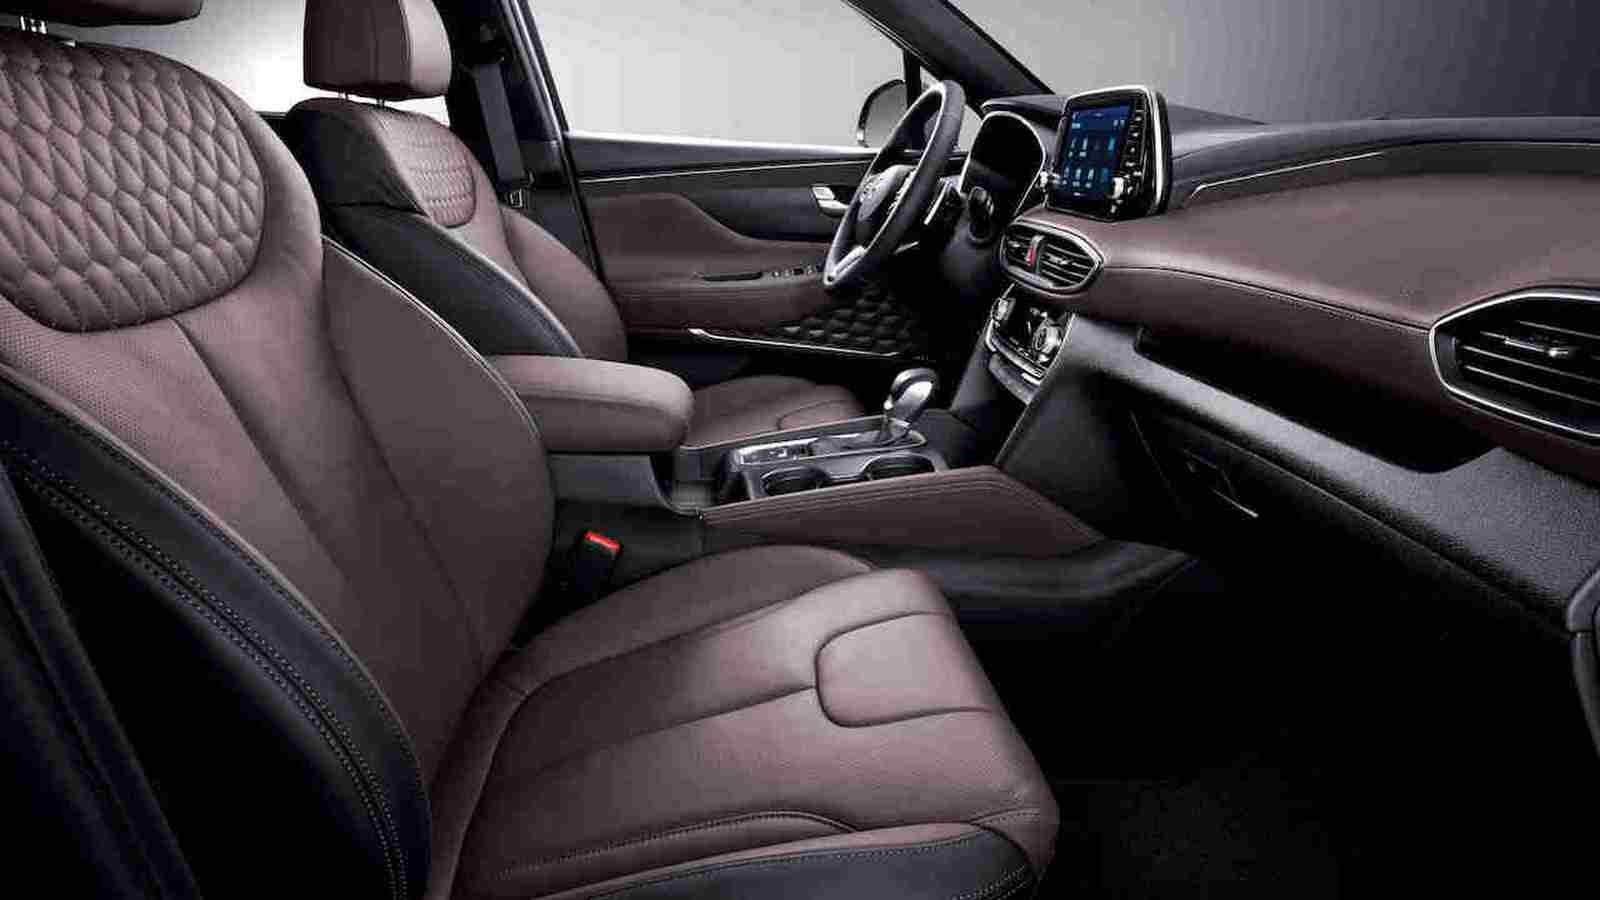 Hyundai-Santa-Fe-Inspiration-interior